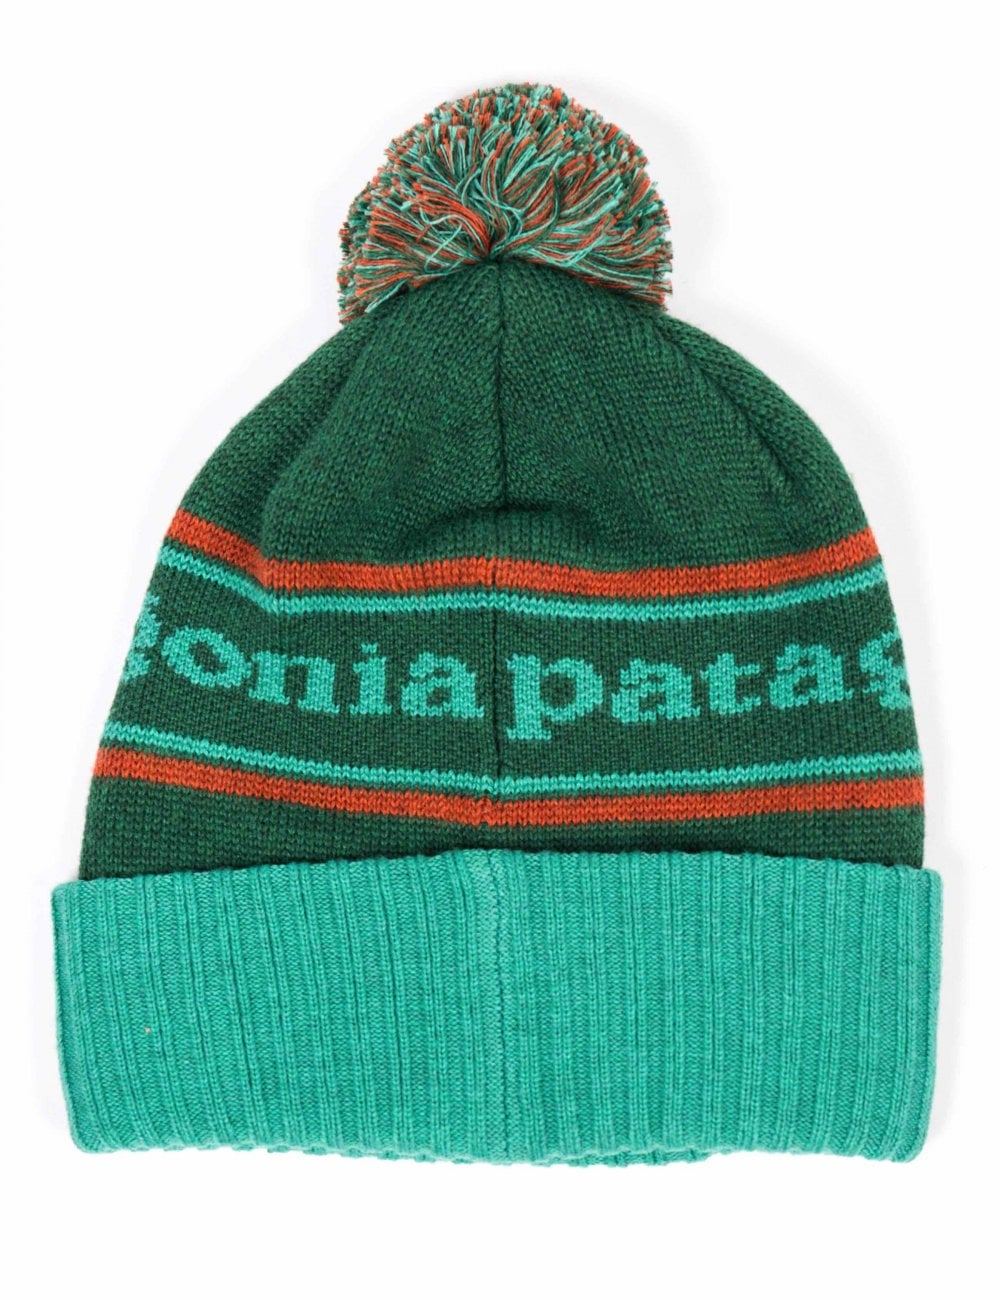 00c8796ac9e Patagonia Powder Town Beanie Hat - Park Stripe  Beryl Green ...